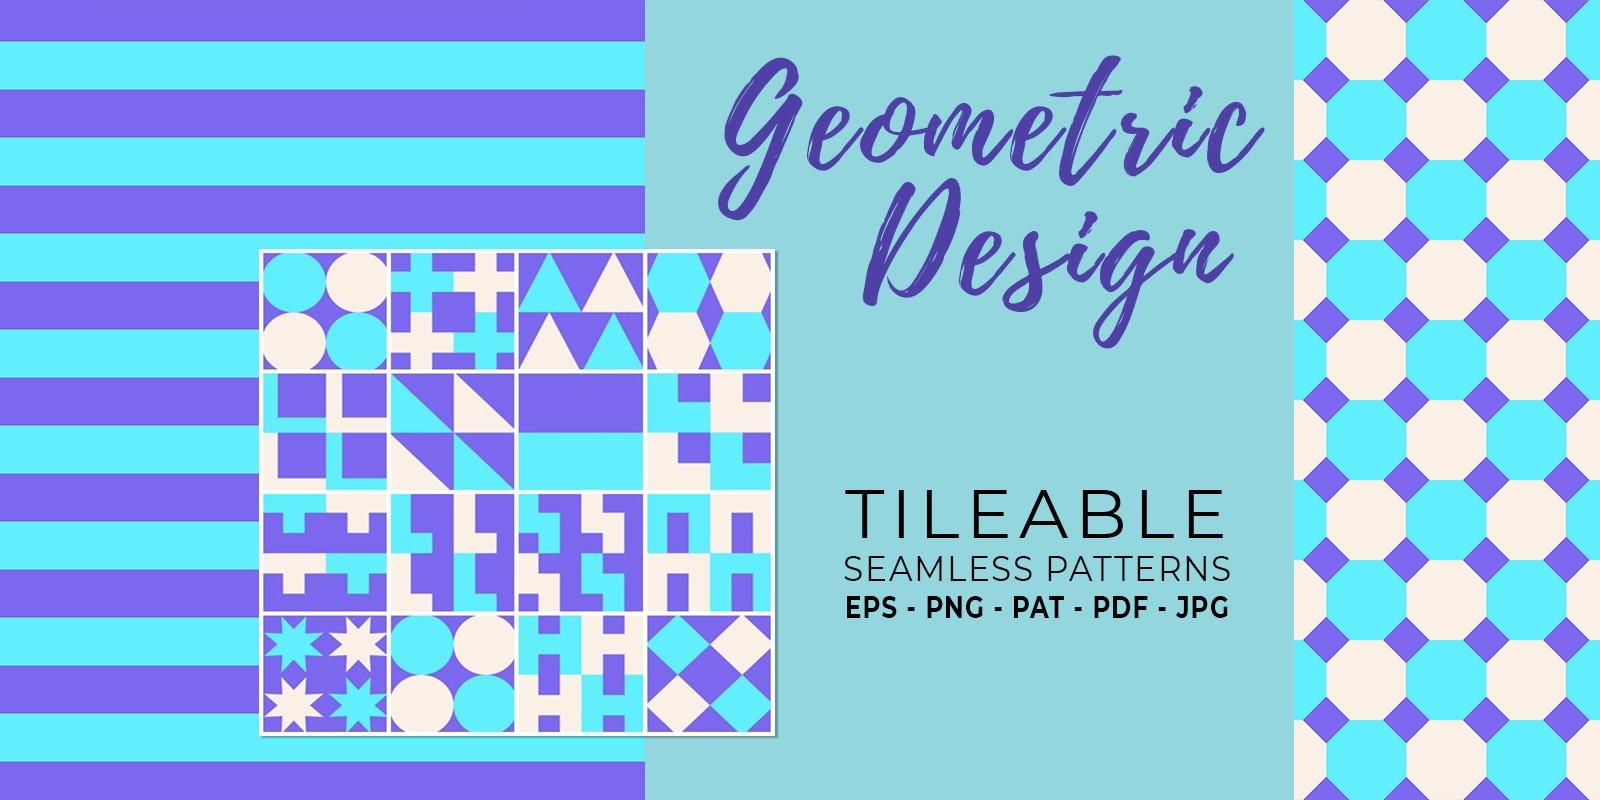 16 Geometric Seamless Tileable Patterns - RGB